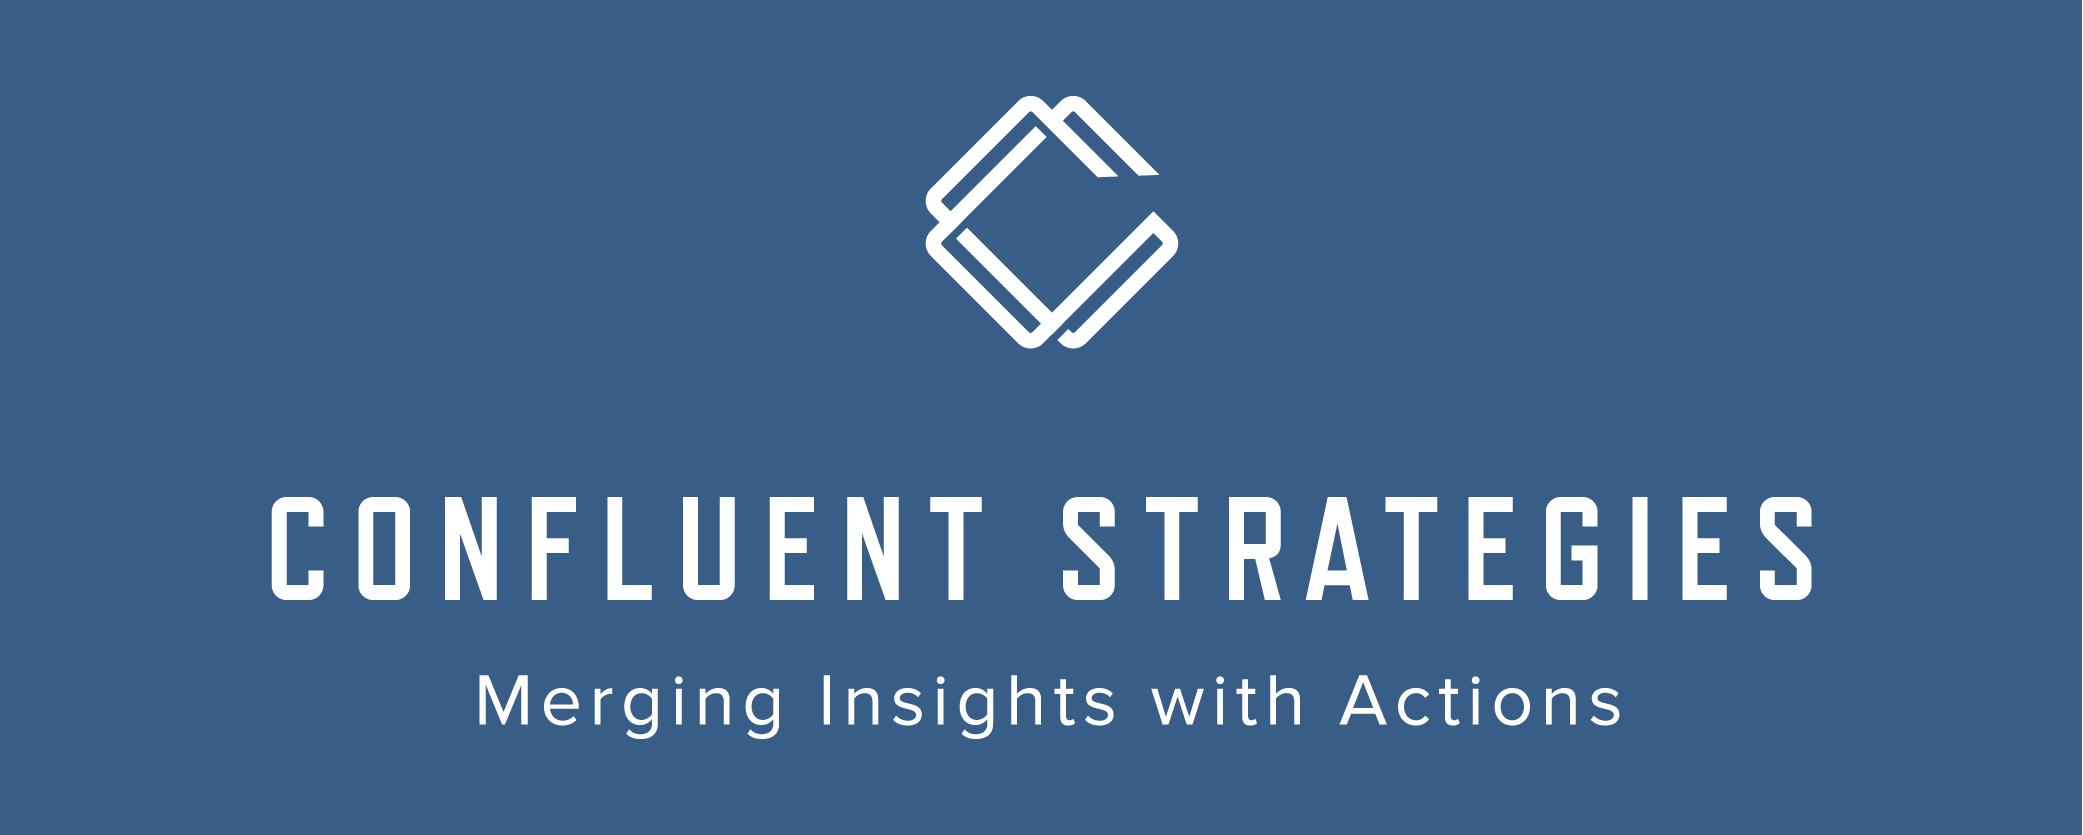 Confluent Strategies